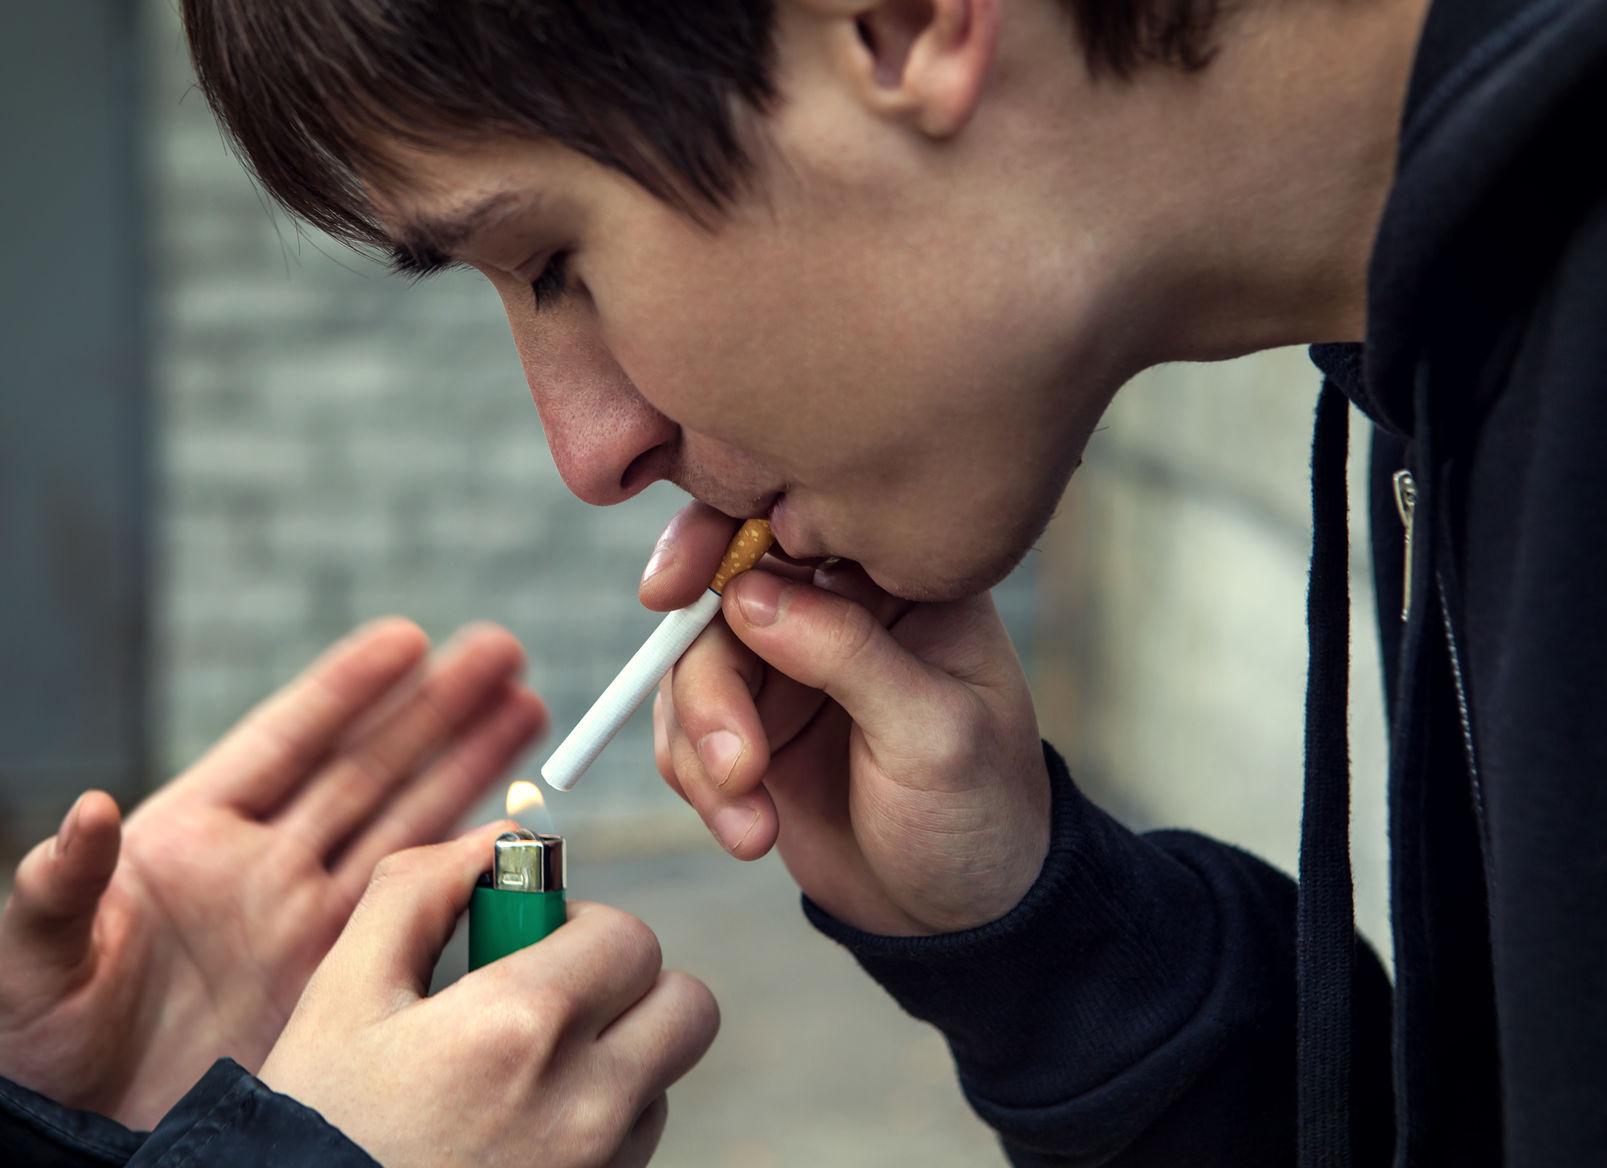 Teens cigarette smoking